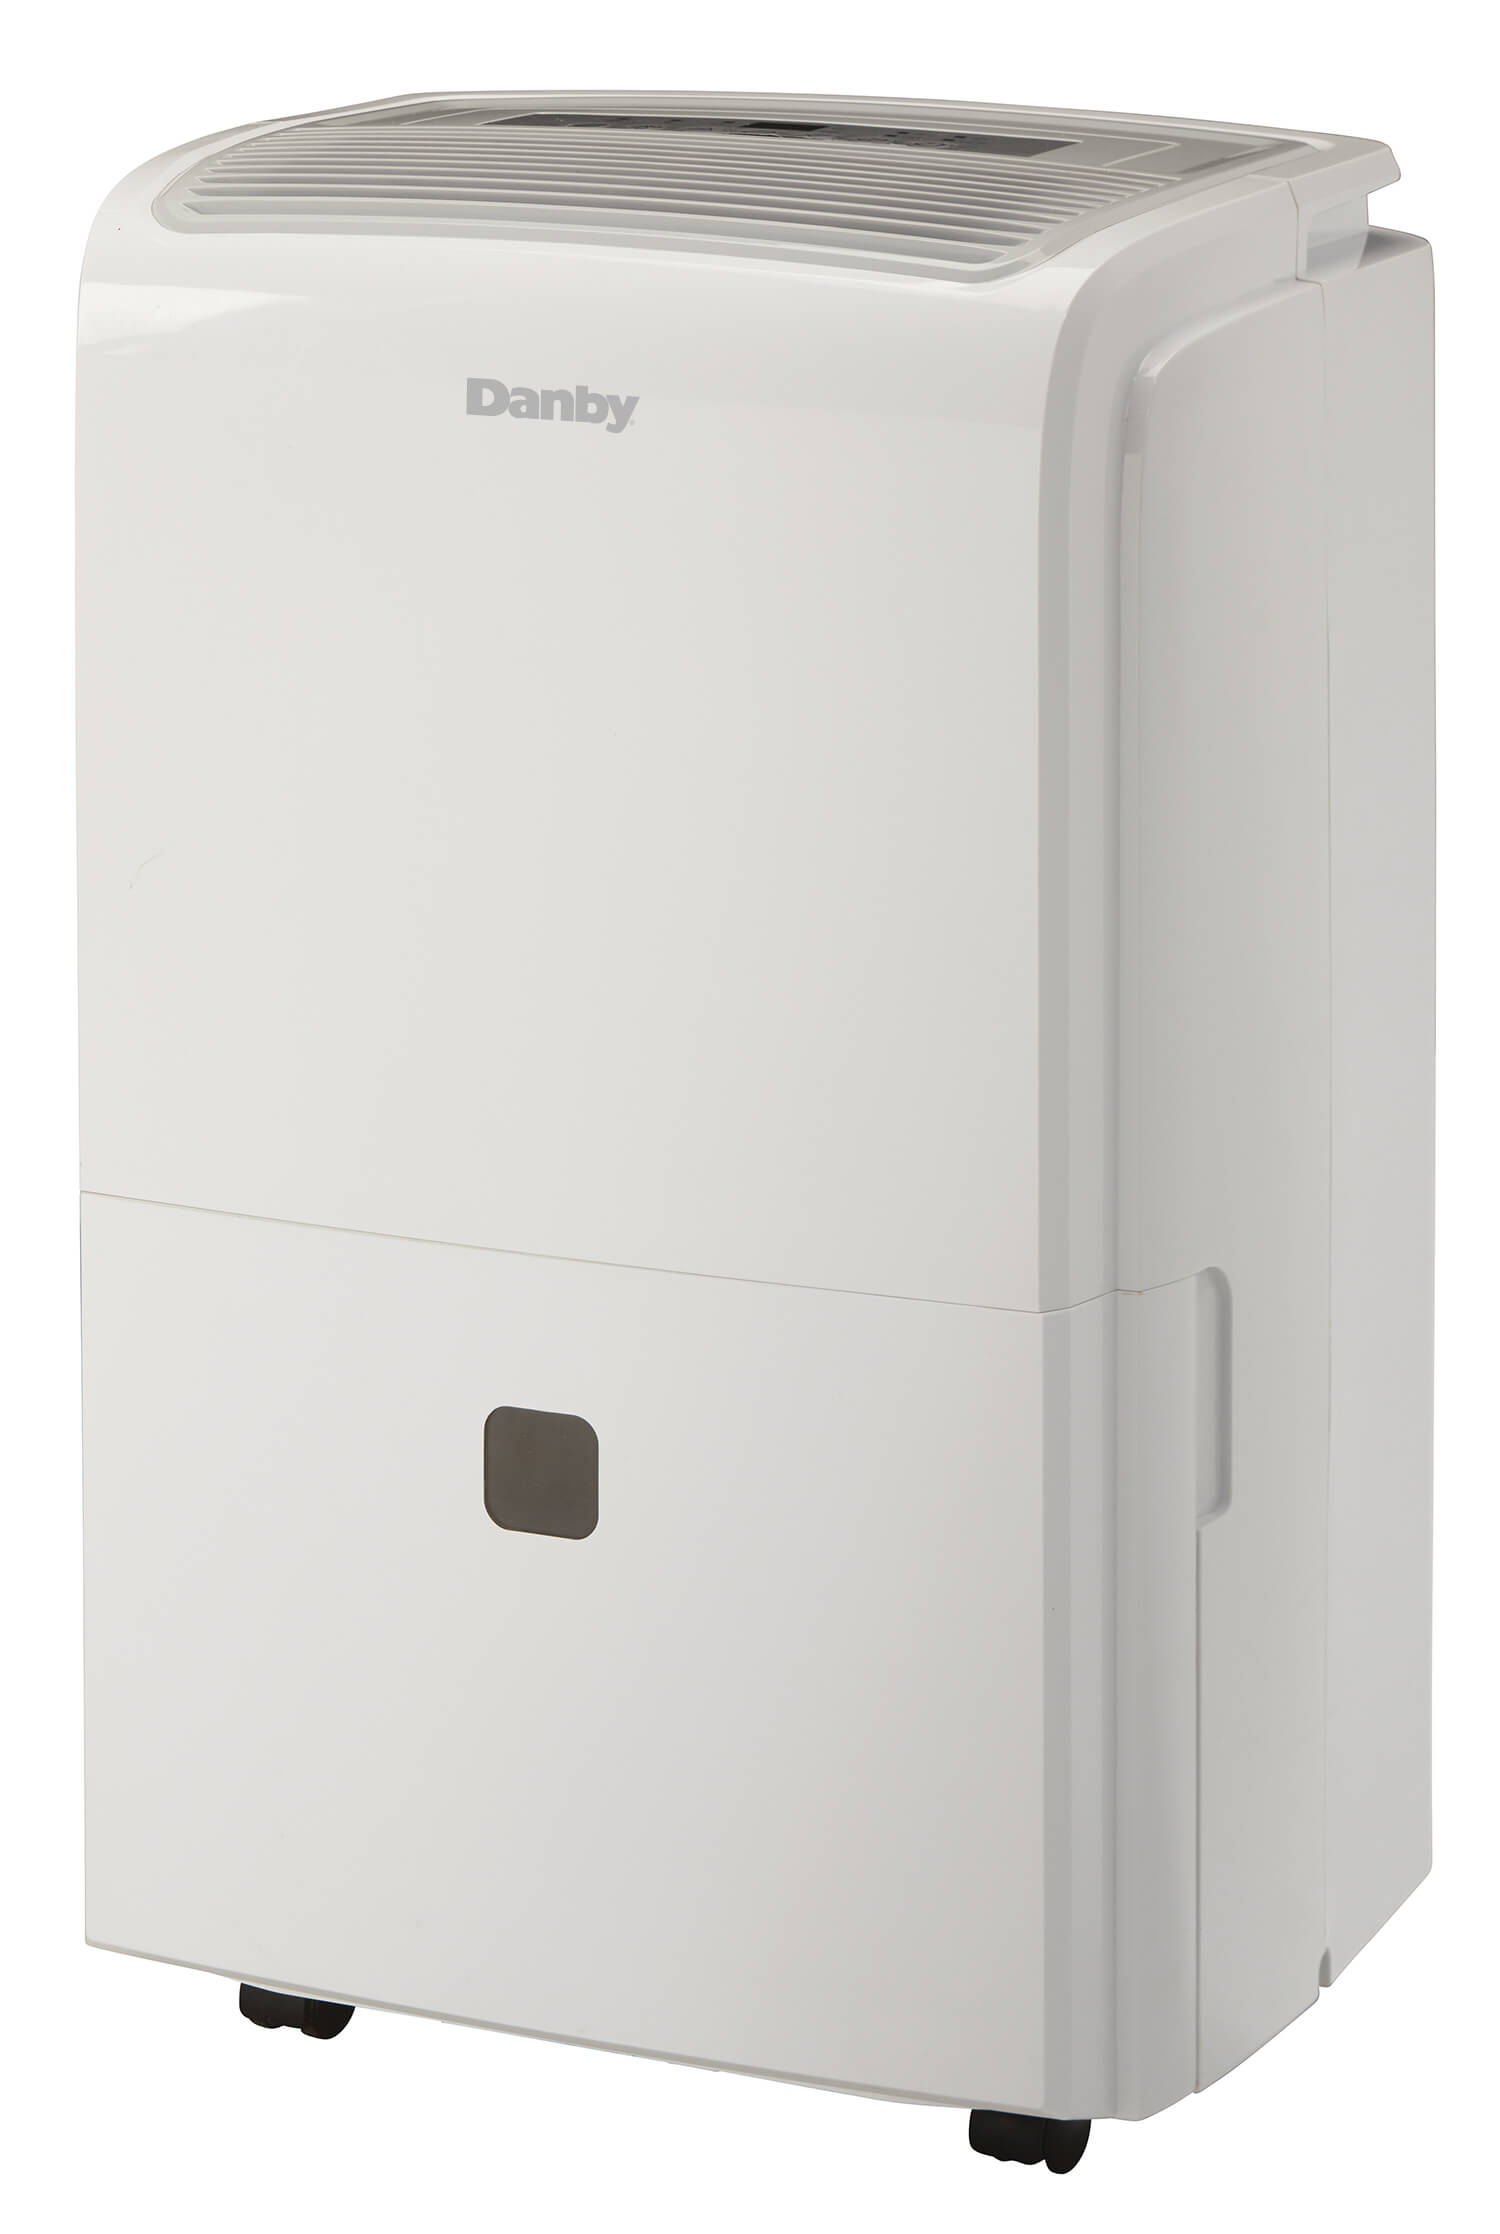 Danby 40 Pint DoE Dehumidifier